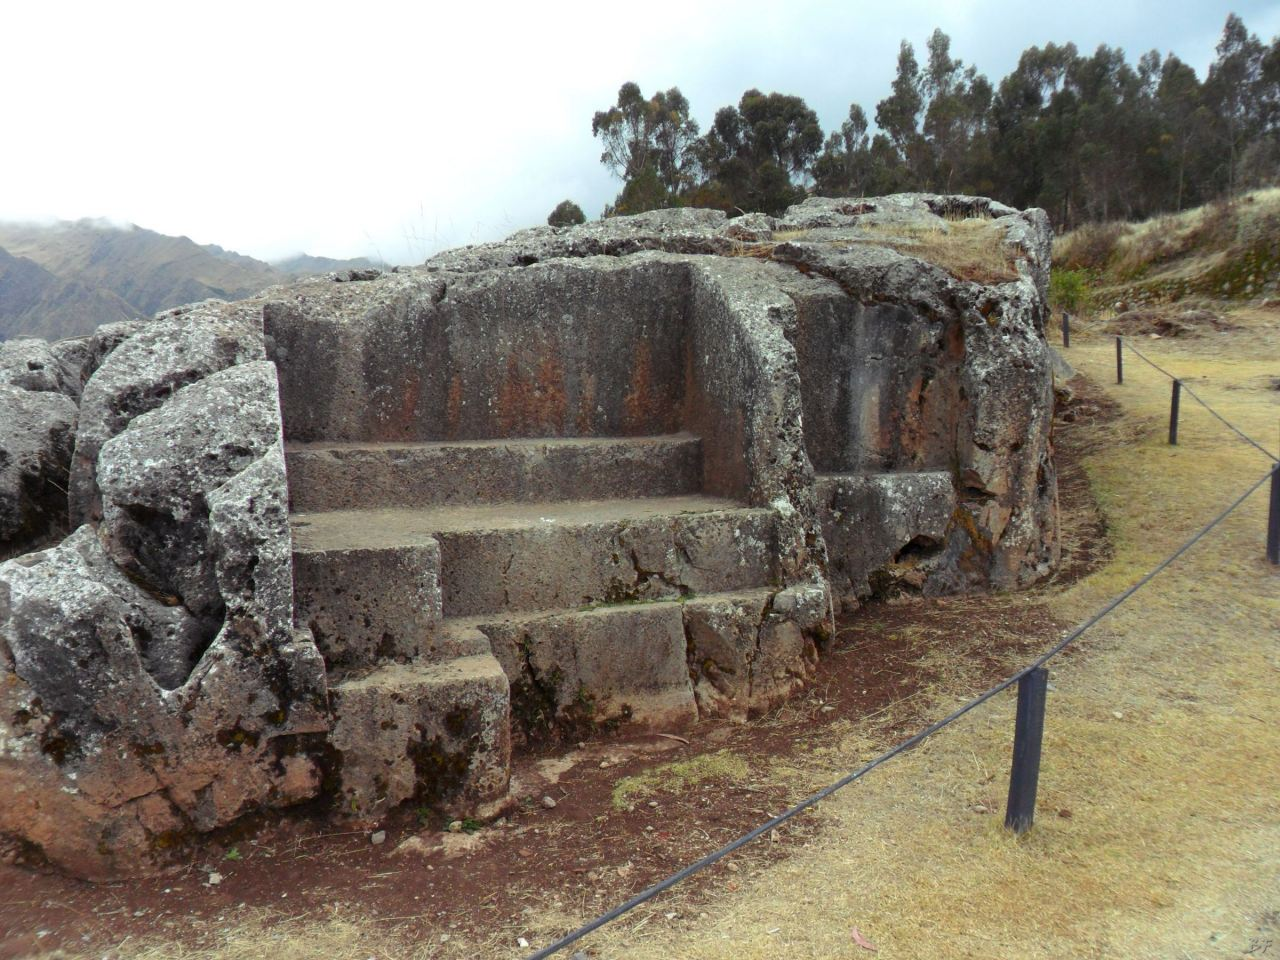 Chinchero-Mura-Poligonali-Piramide-Urubamba-Peru-43